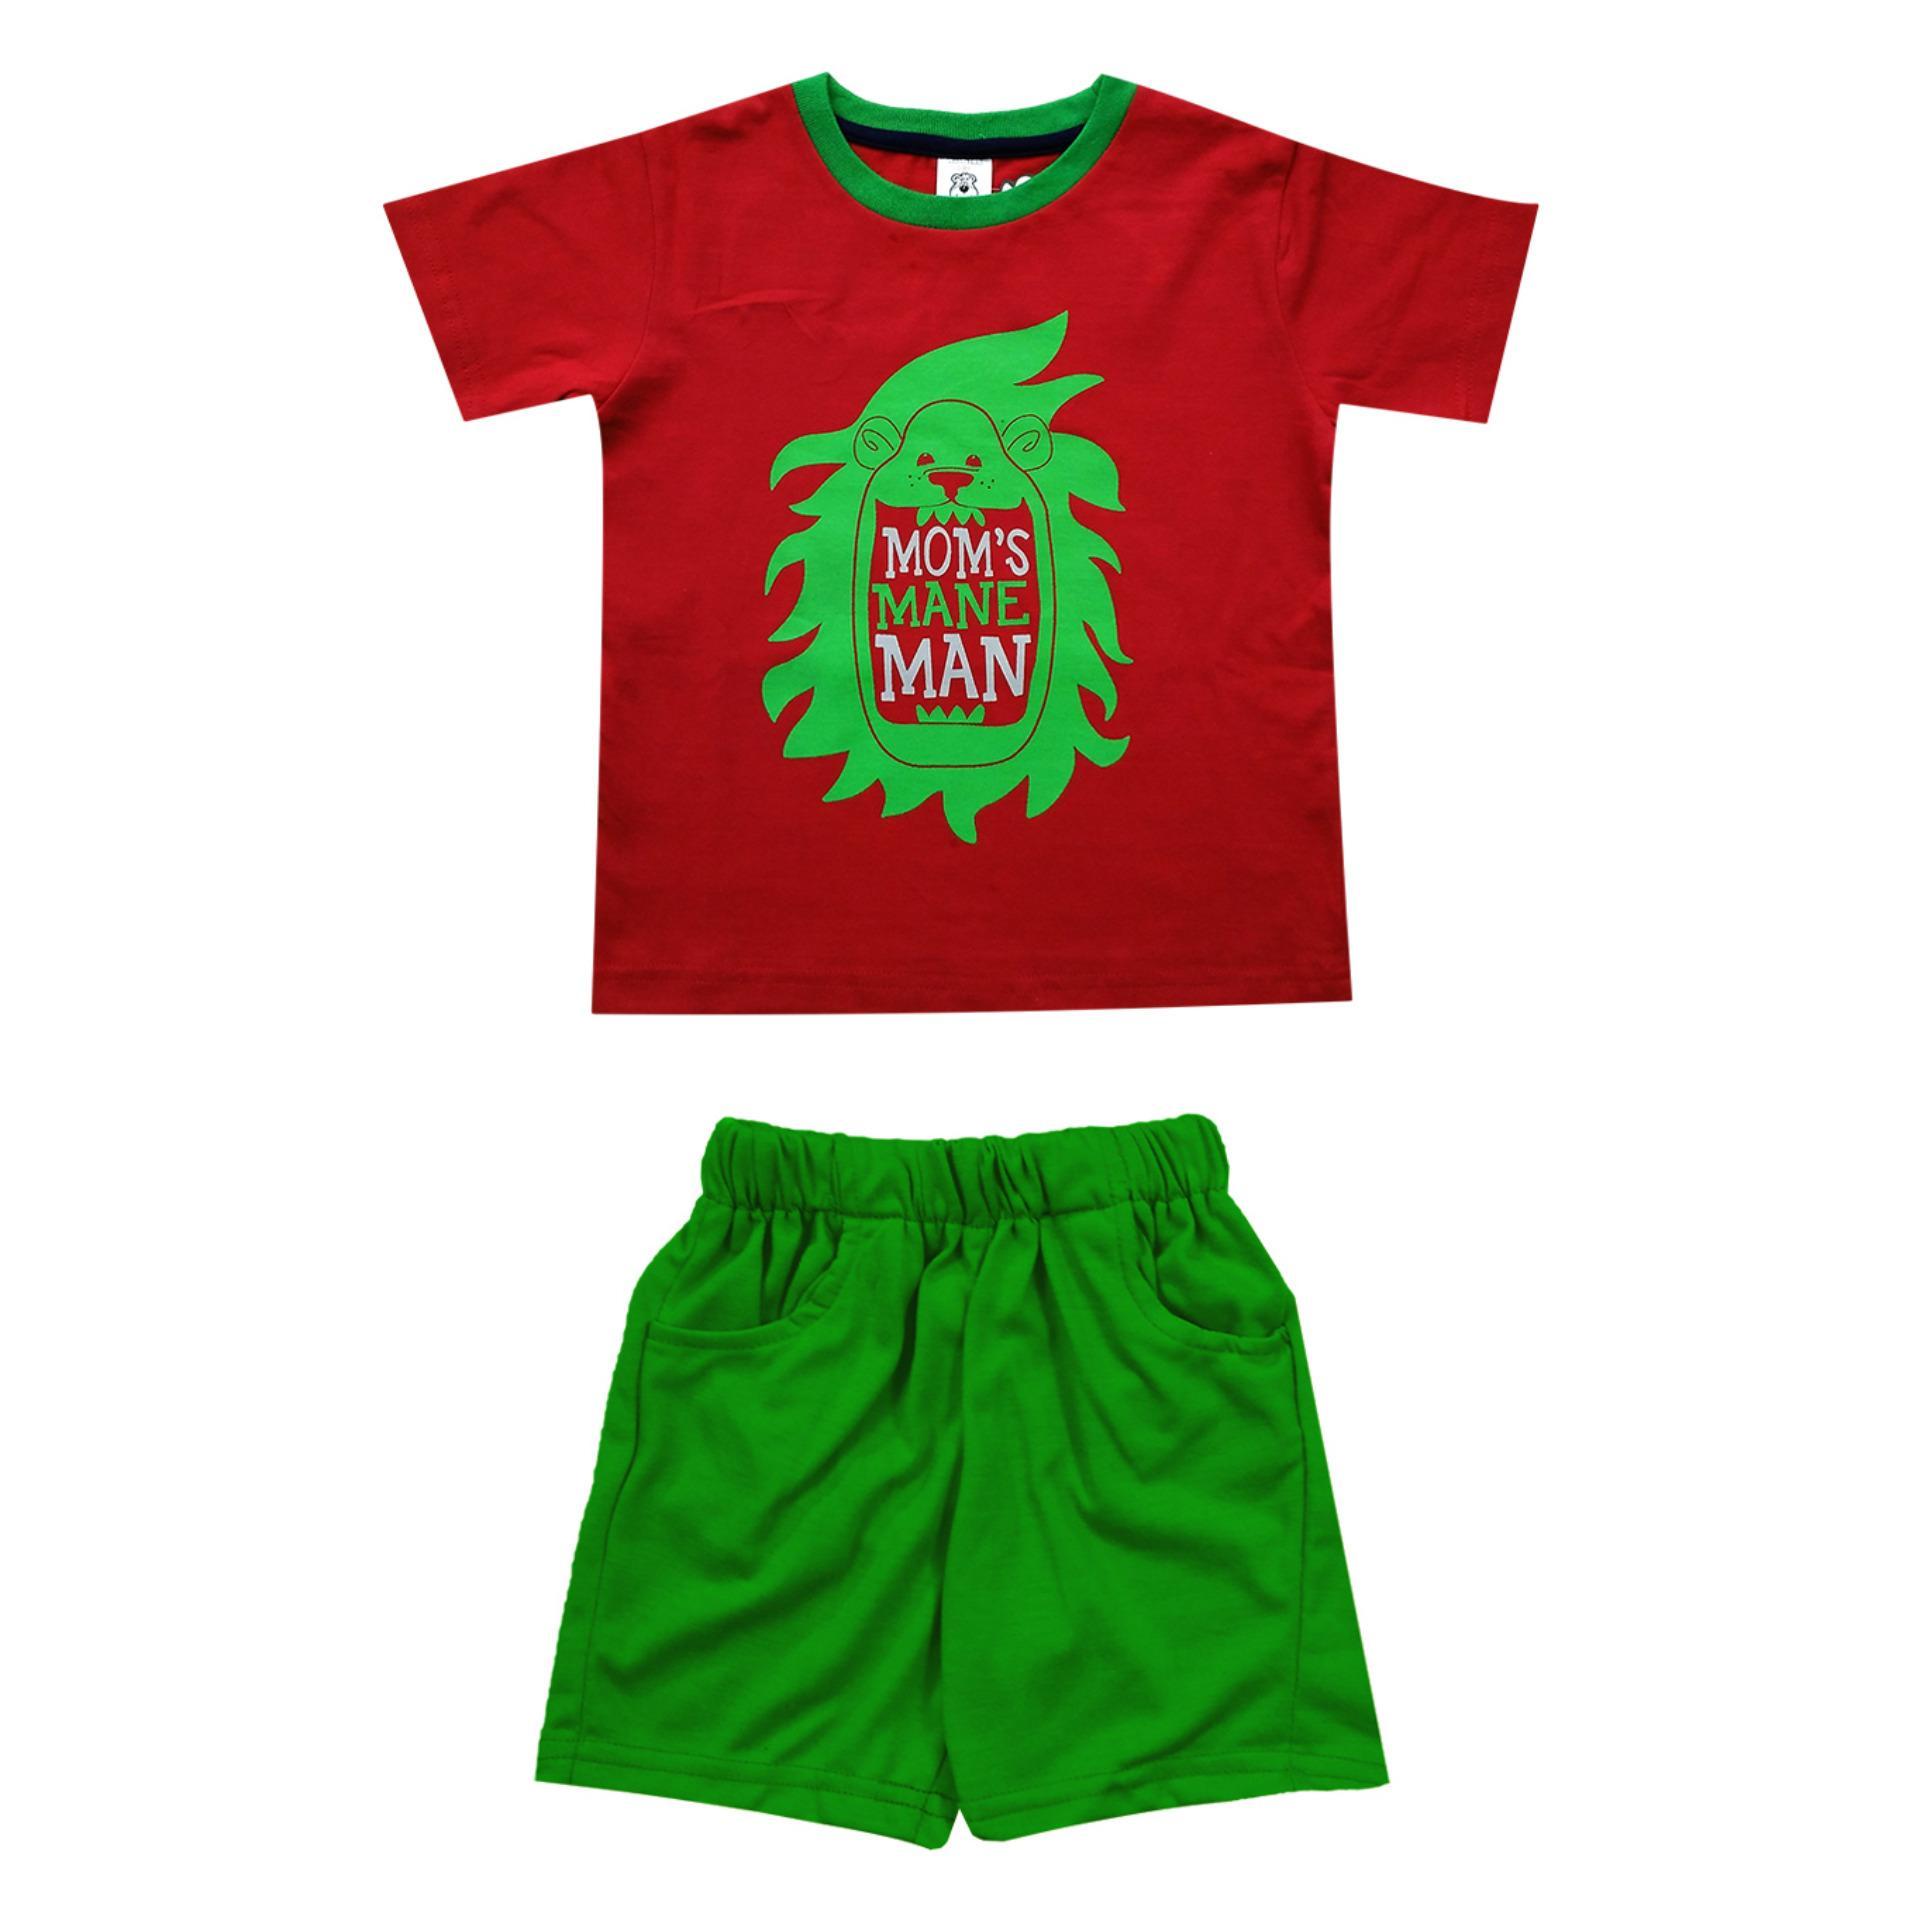 MacBear Kids Baju Anak Setelan T-Shirt  Mom's Mane Man